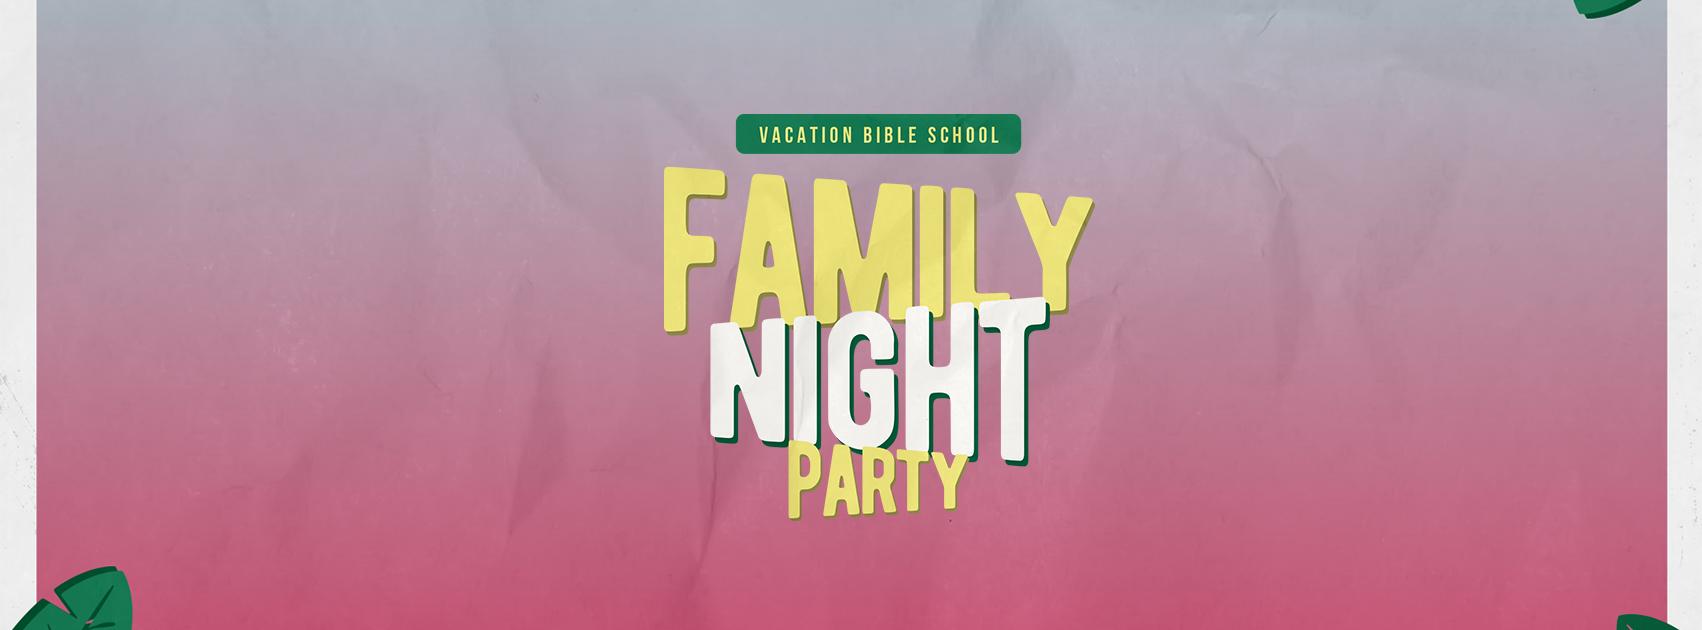 VBS Family Night FB Cover Photo.jpg